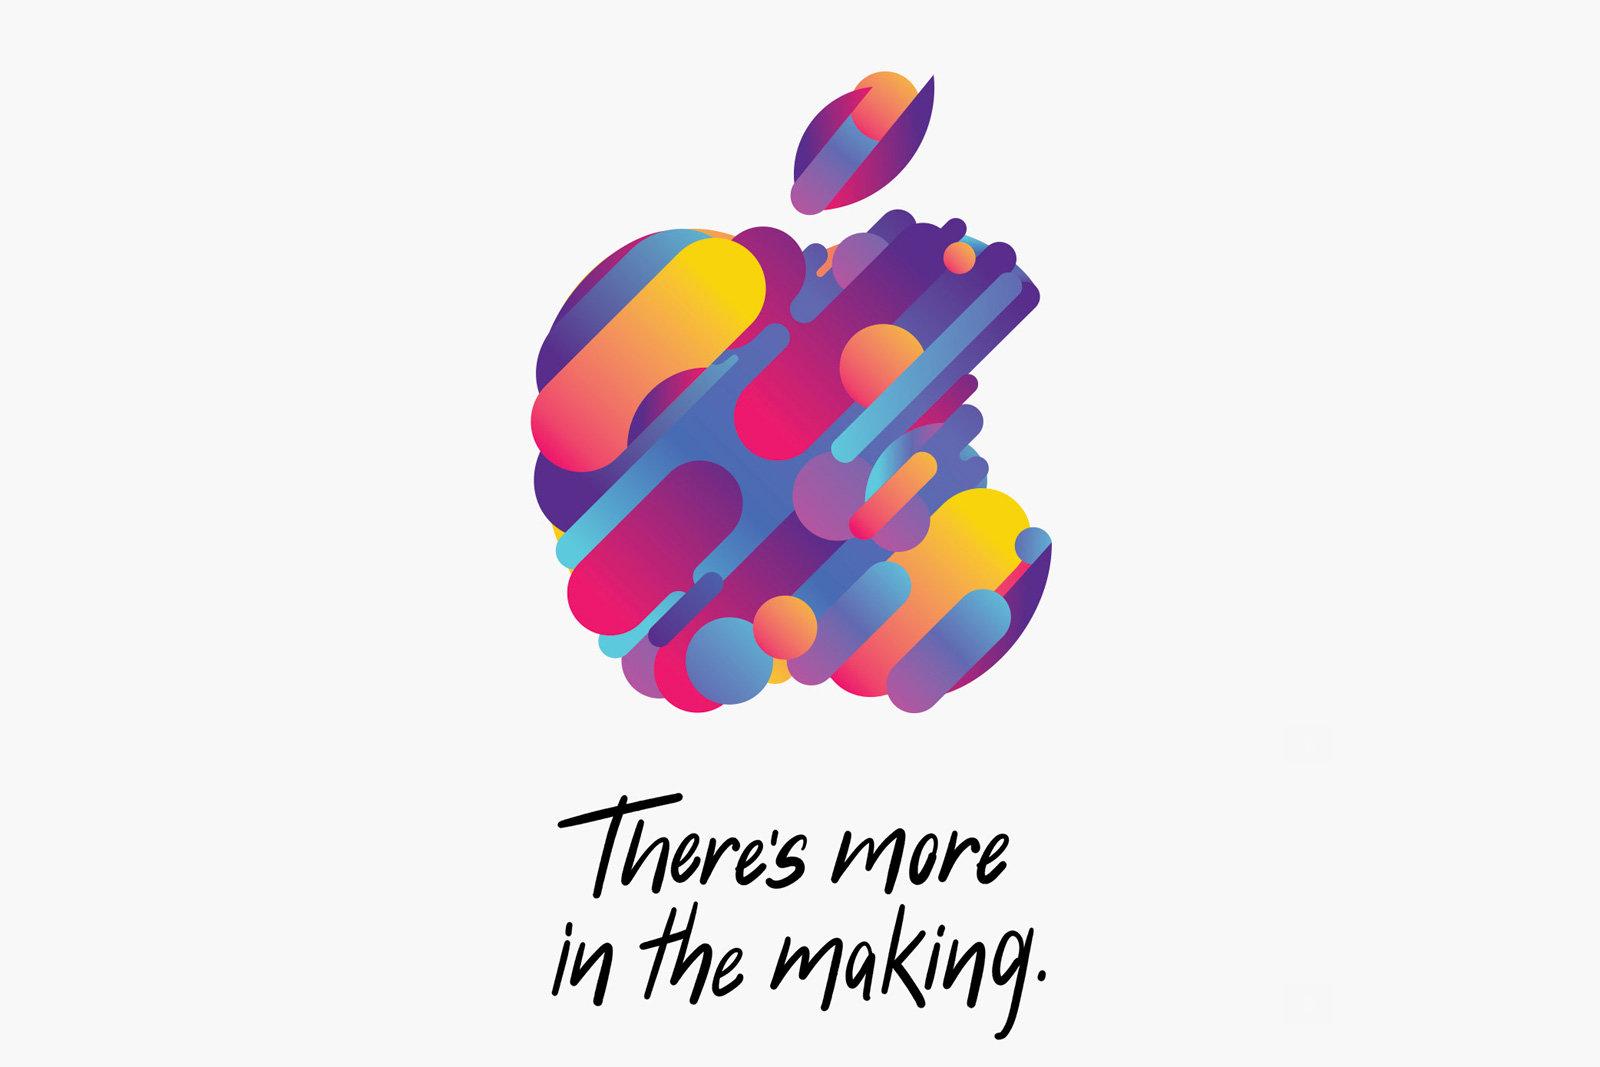 Apple event October 30